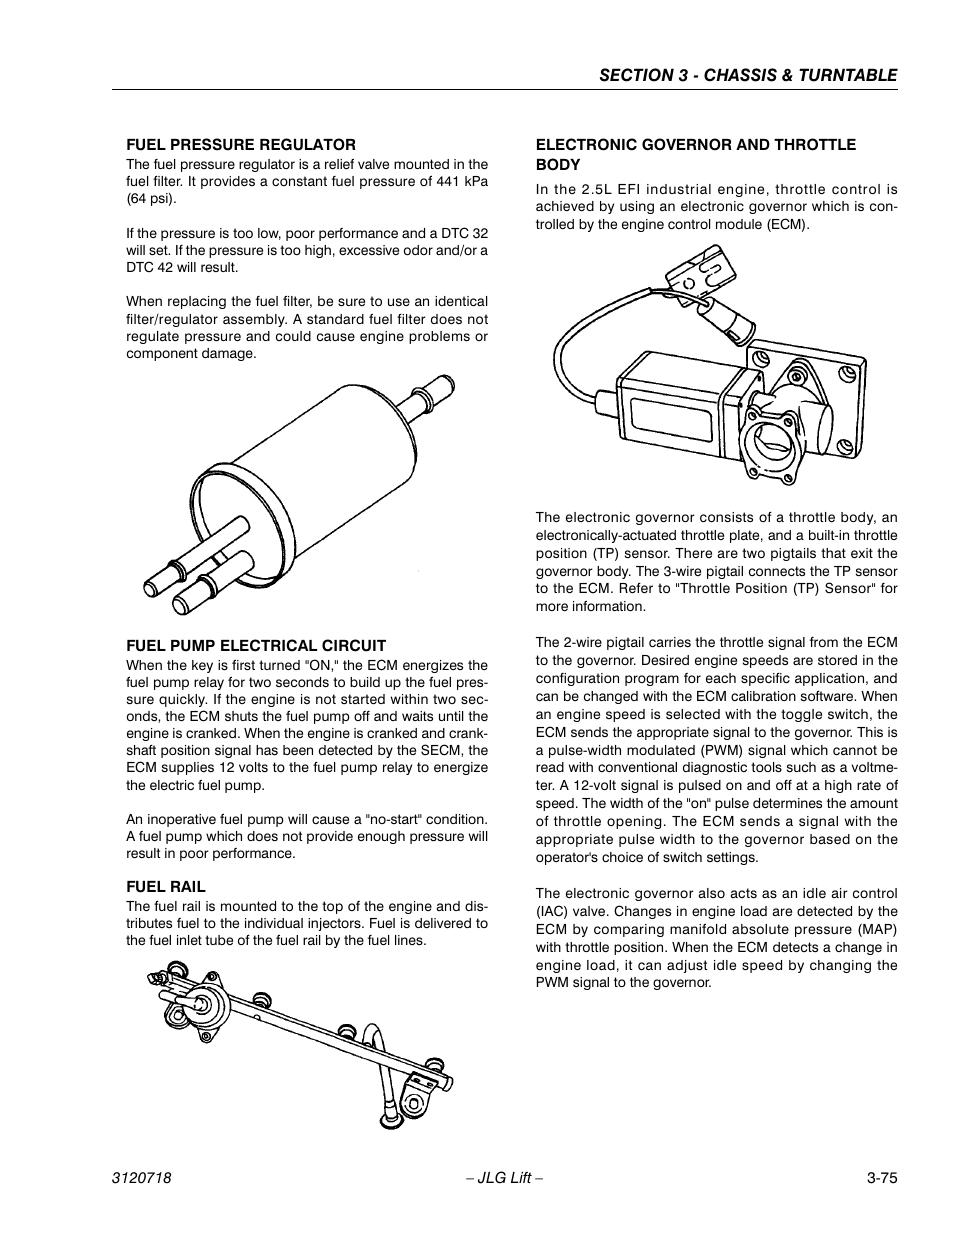 jlg 660sj ansi service manual user manual